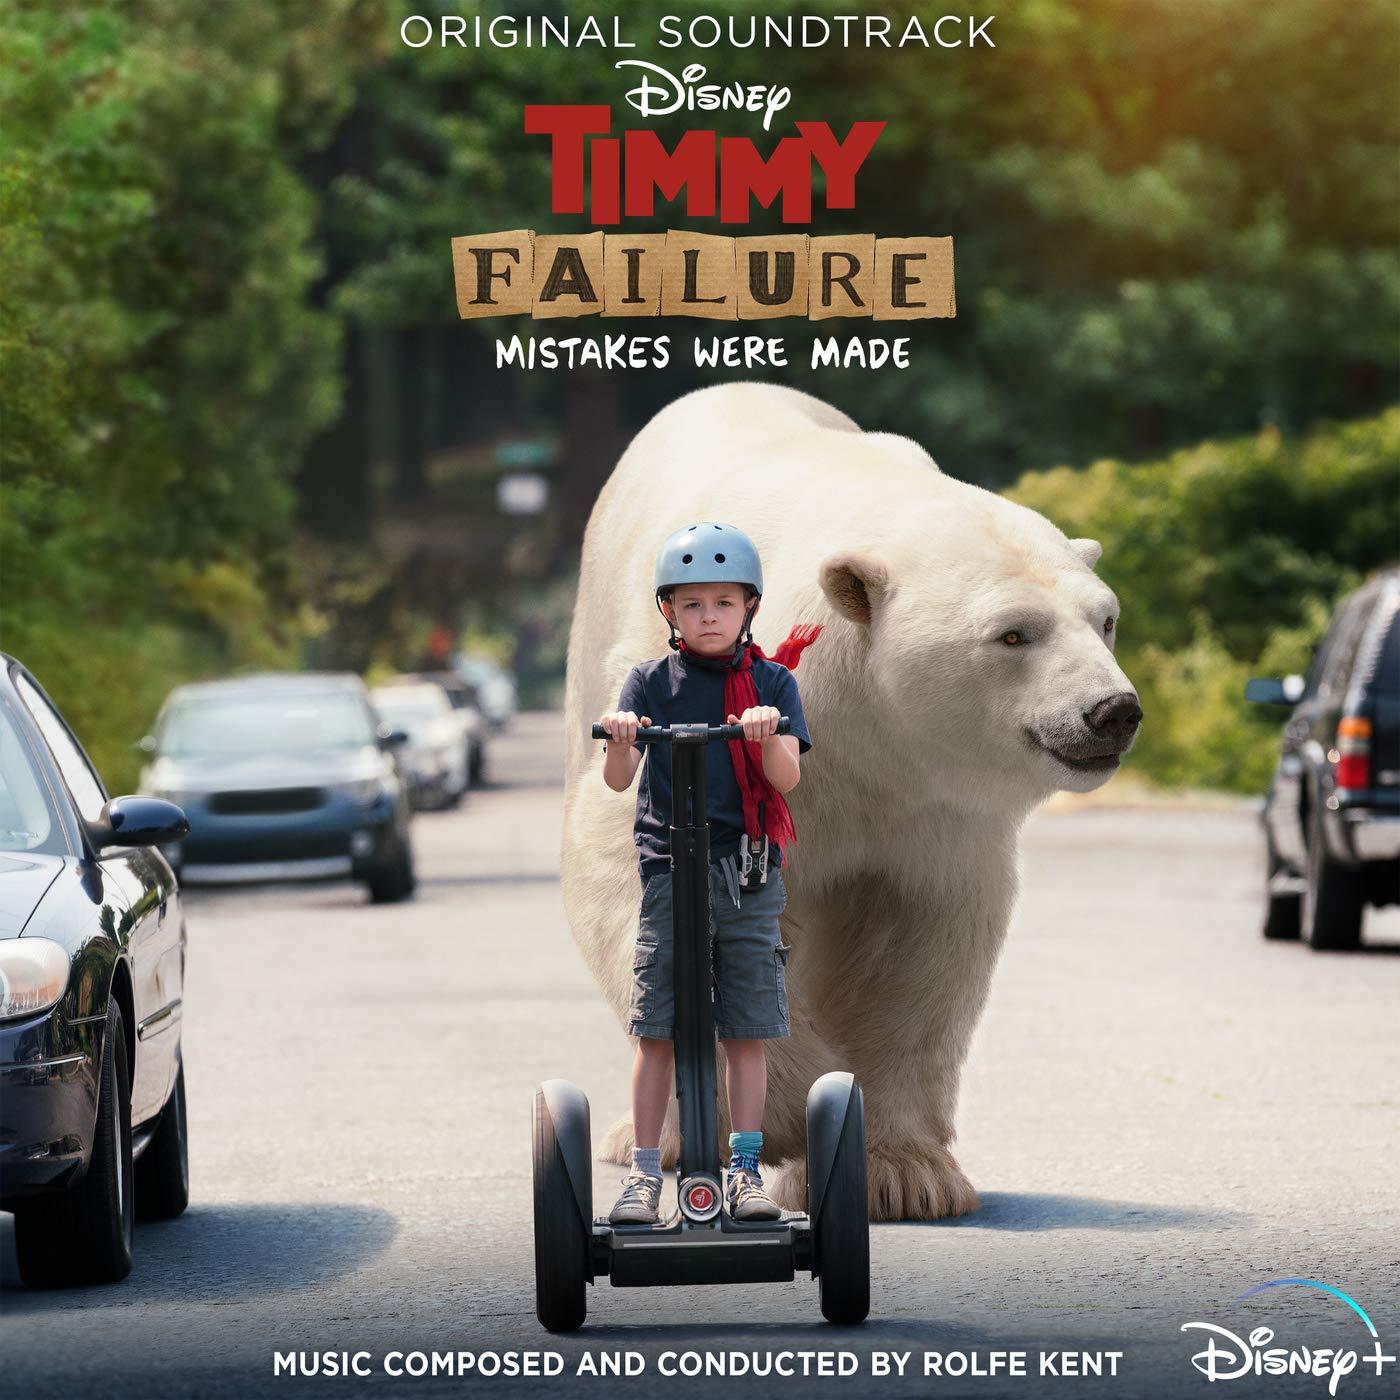 bande originale soundtrack ost score timmy failure mistakes were made disney+ plus